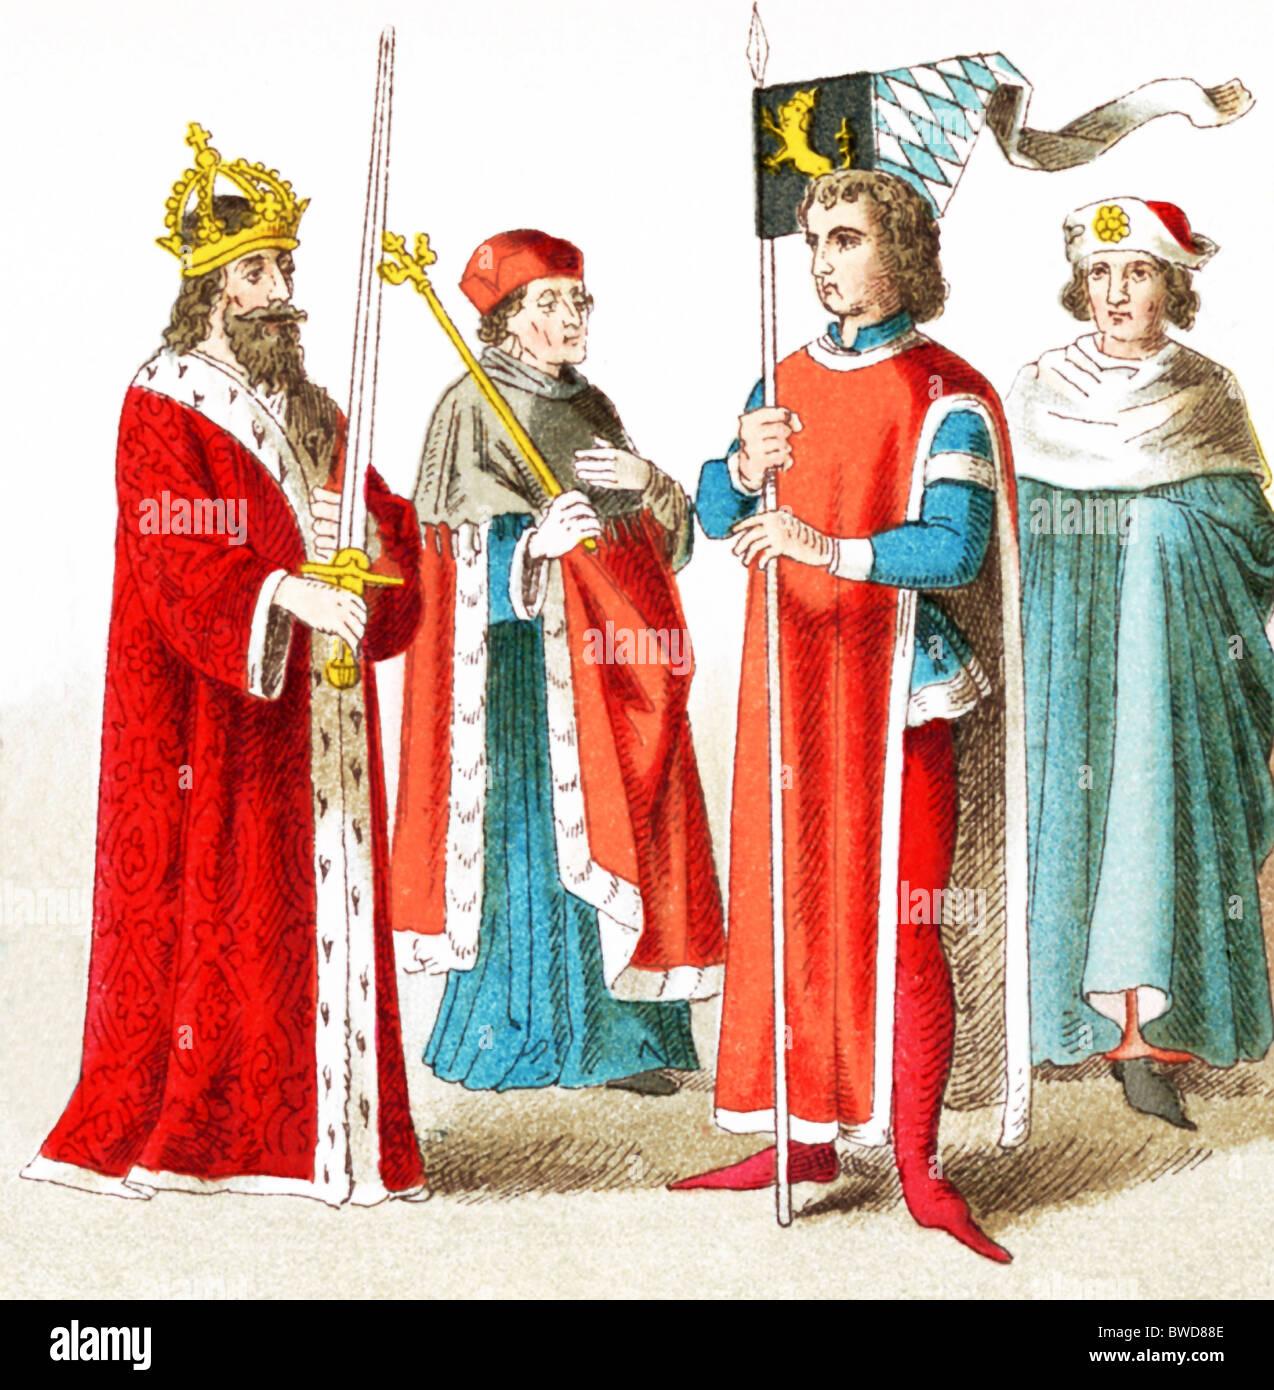 The figures pictured here represent Germans: A.D. 1400–1450:Emperor Sigismund, Electer Bishop, Duke of Bavaria, - Stock Image